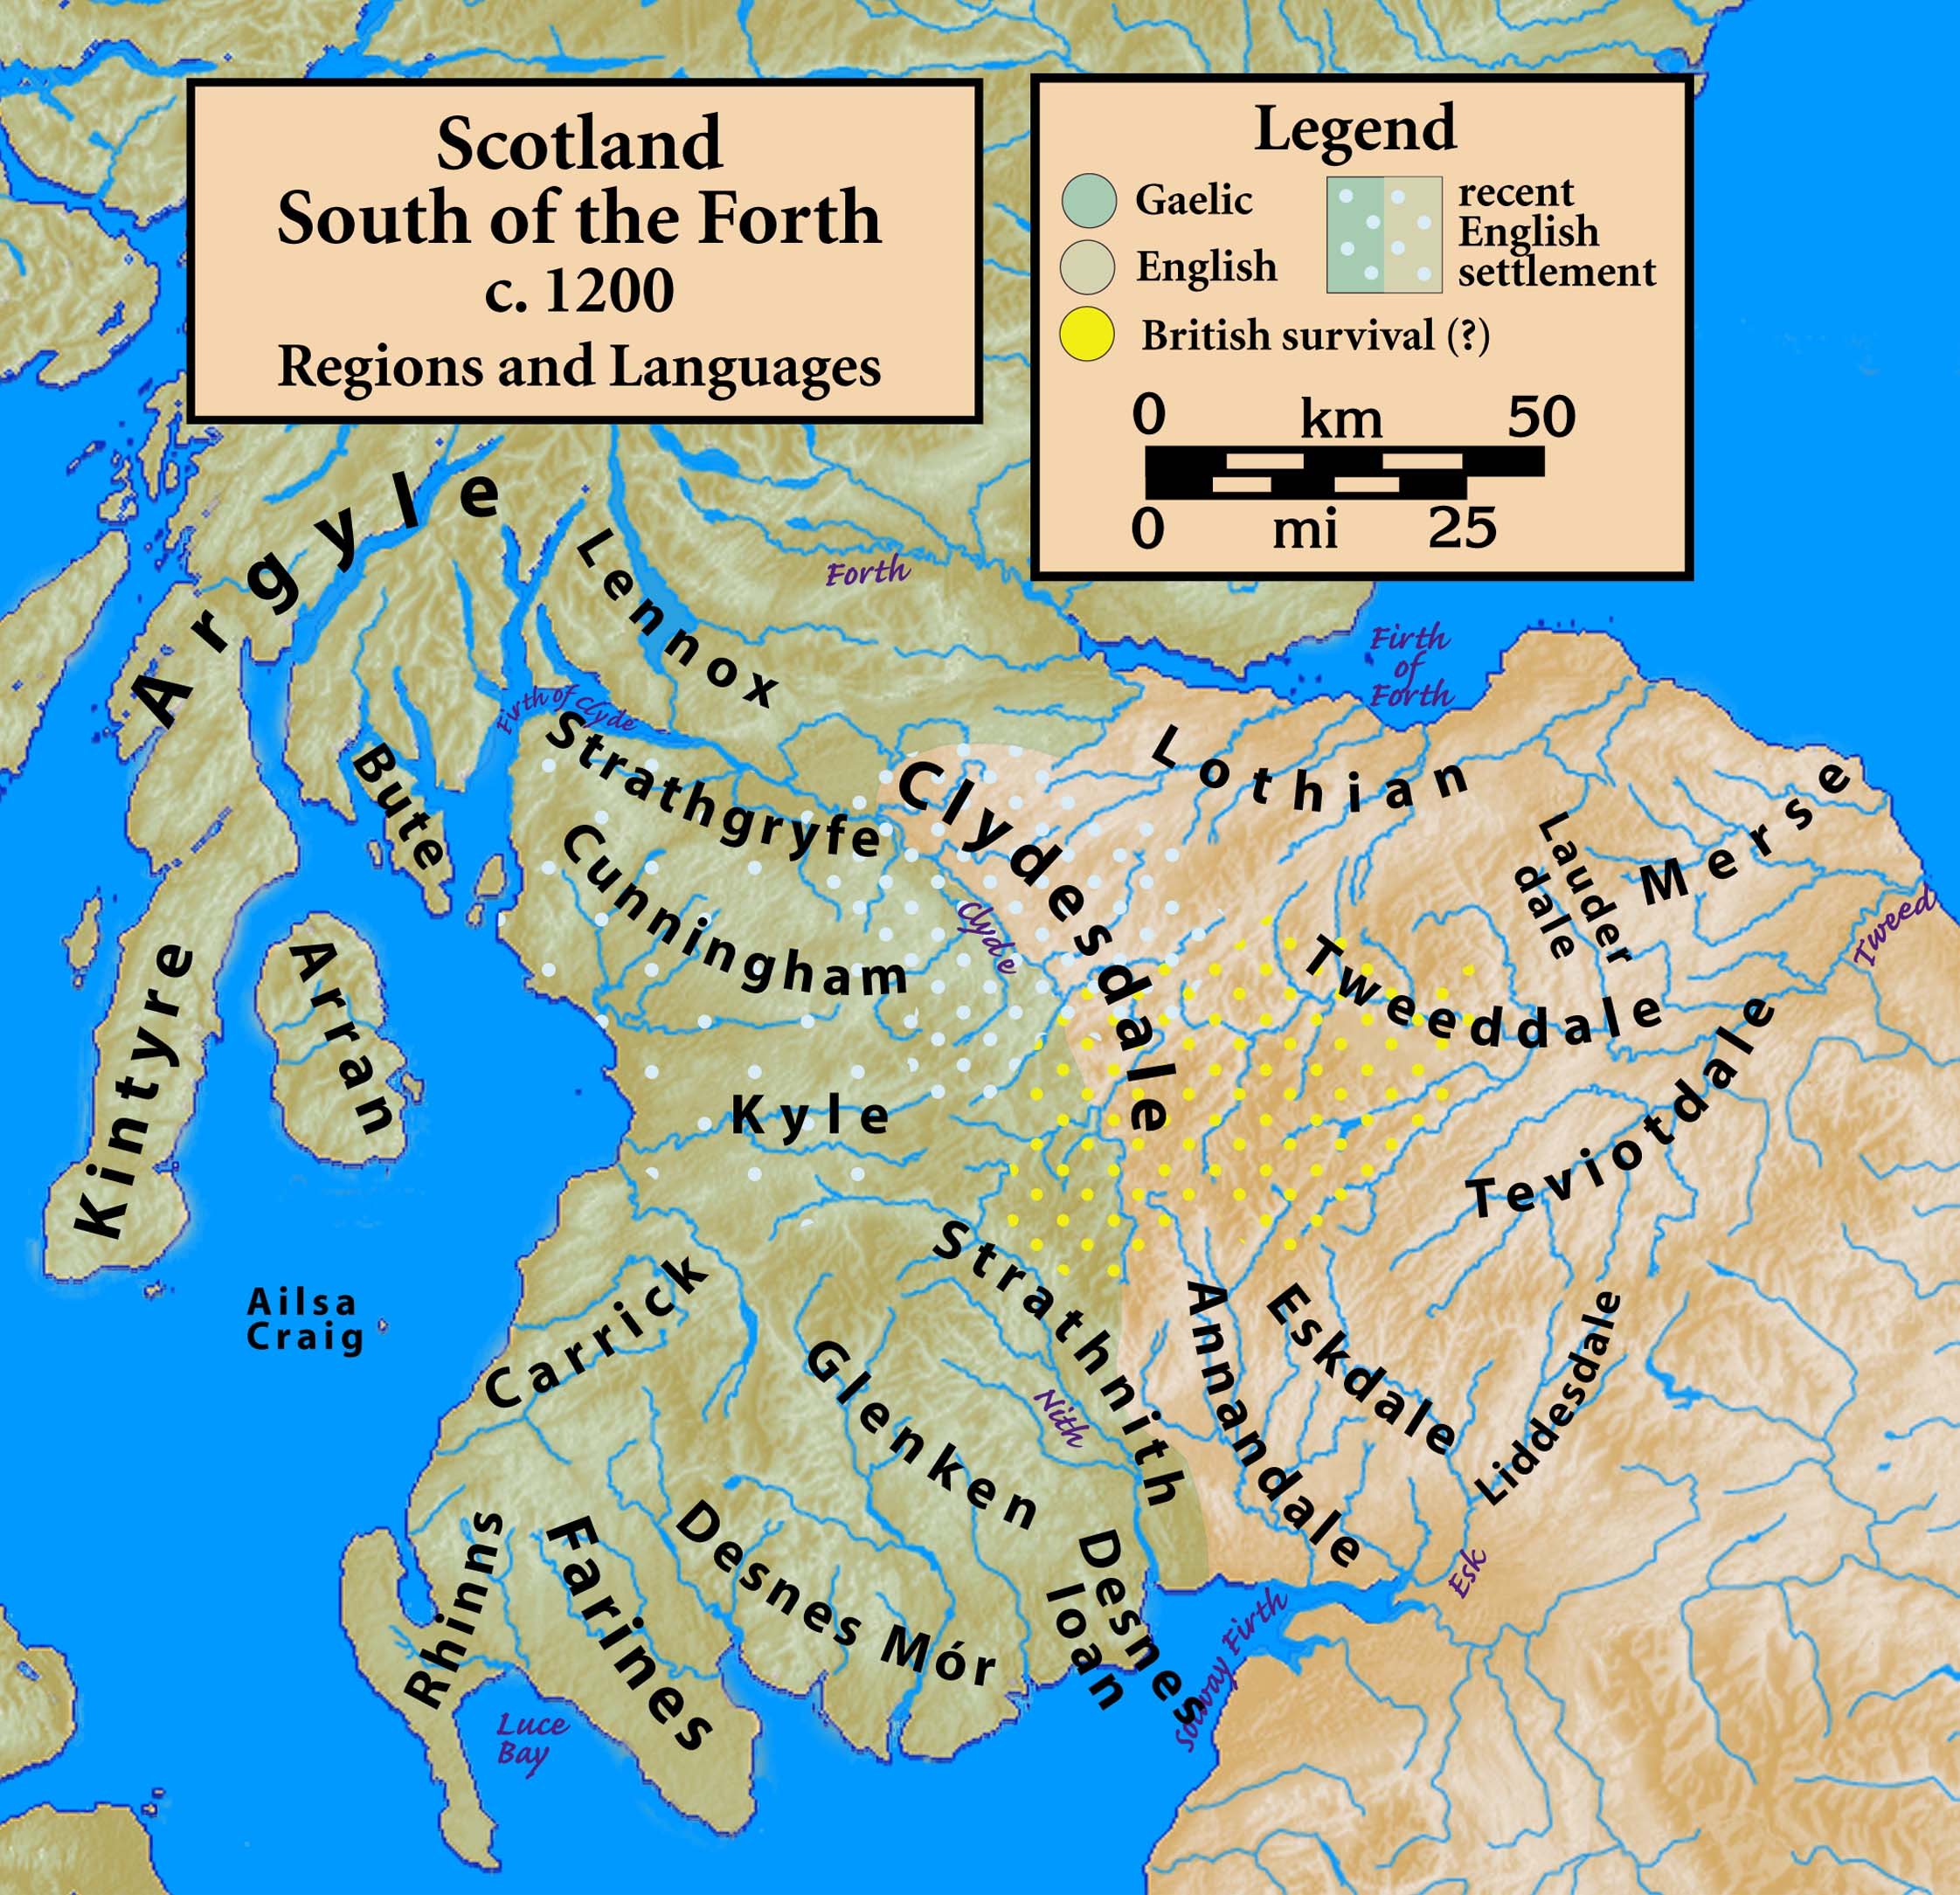 http://en.wikipedia.org/wiki/File:Scotland.south.c1200.regions.languages.jpg